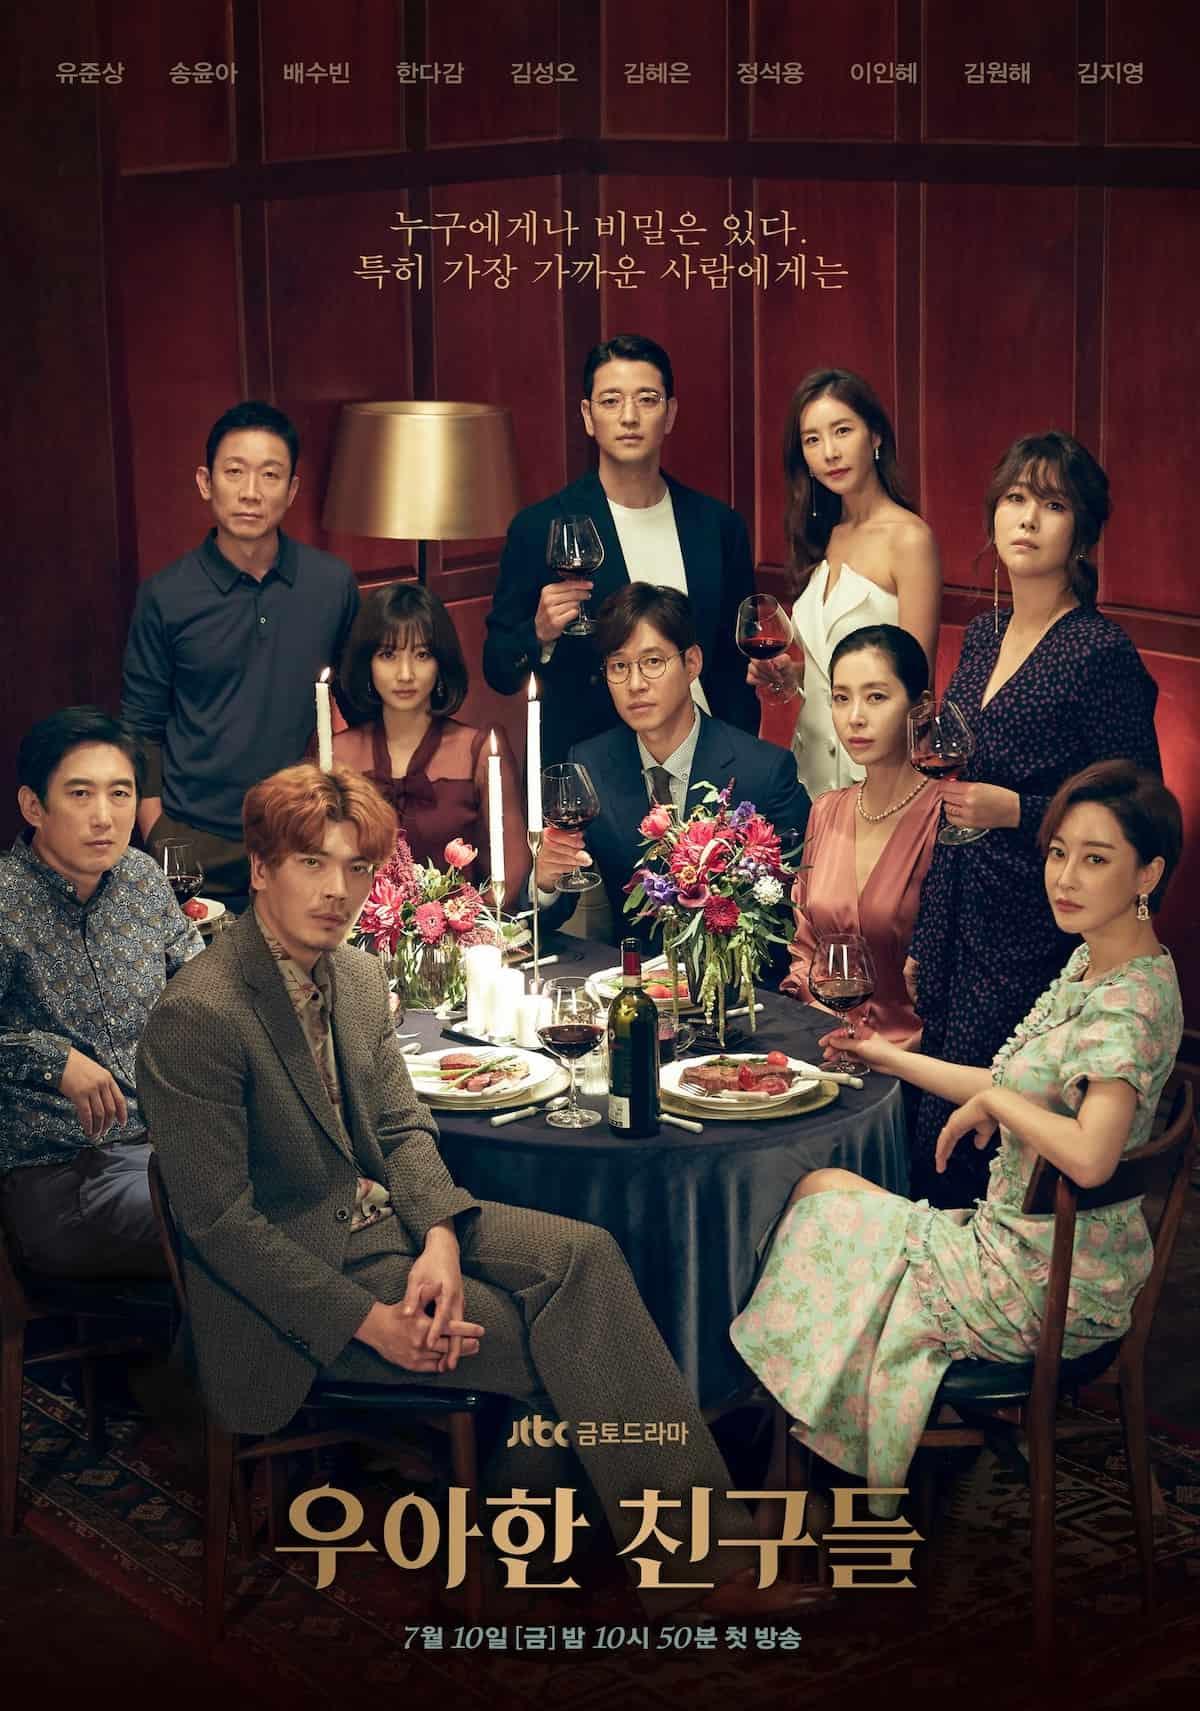 Graceful Friends (2020) หักเหลี่ยมโหด เกมมิตรภาพ ซับไทย EP1 – EP9